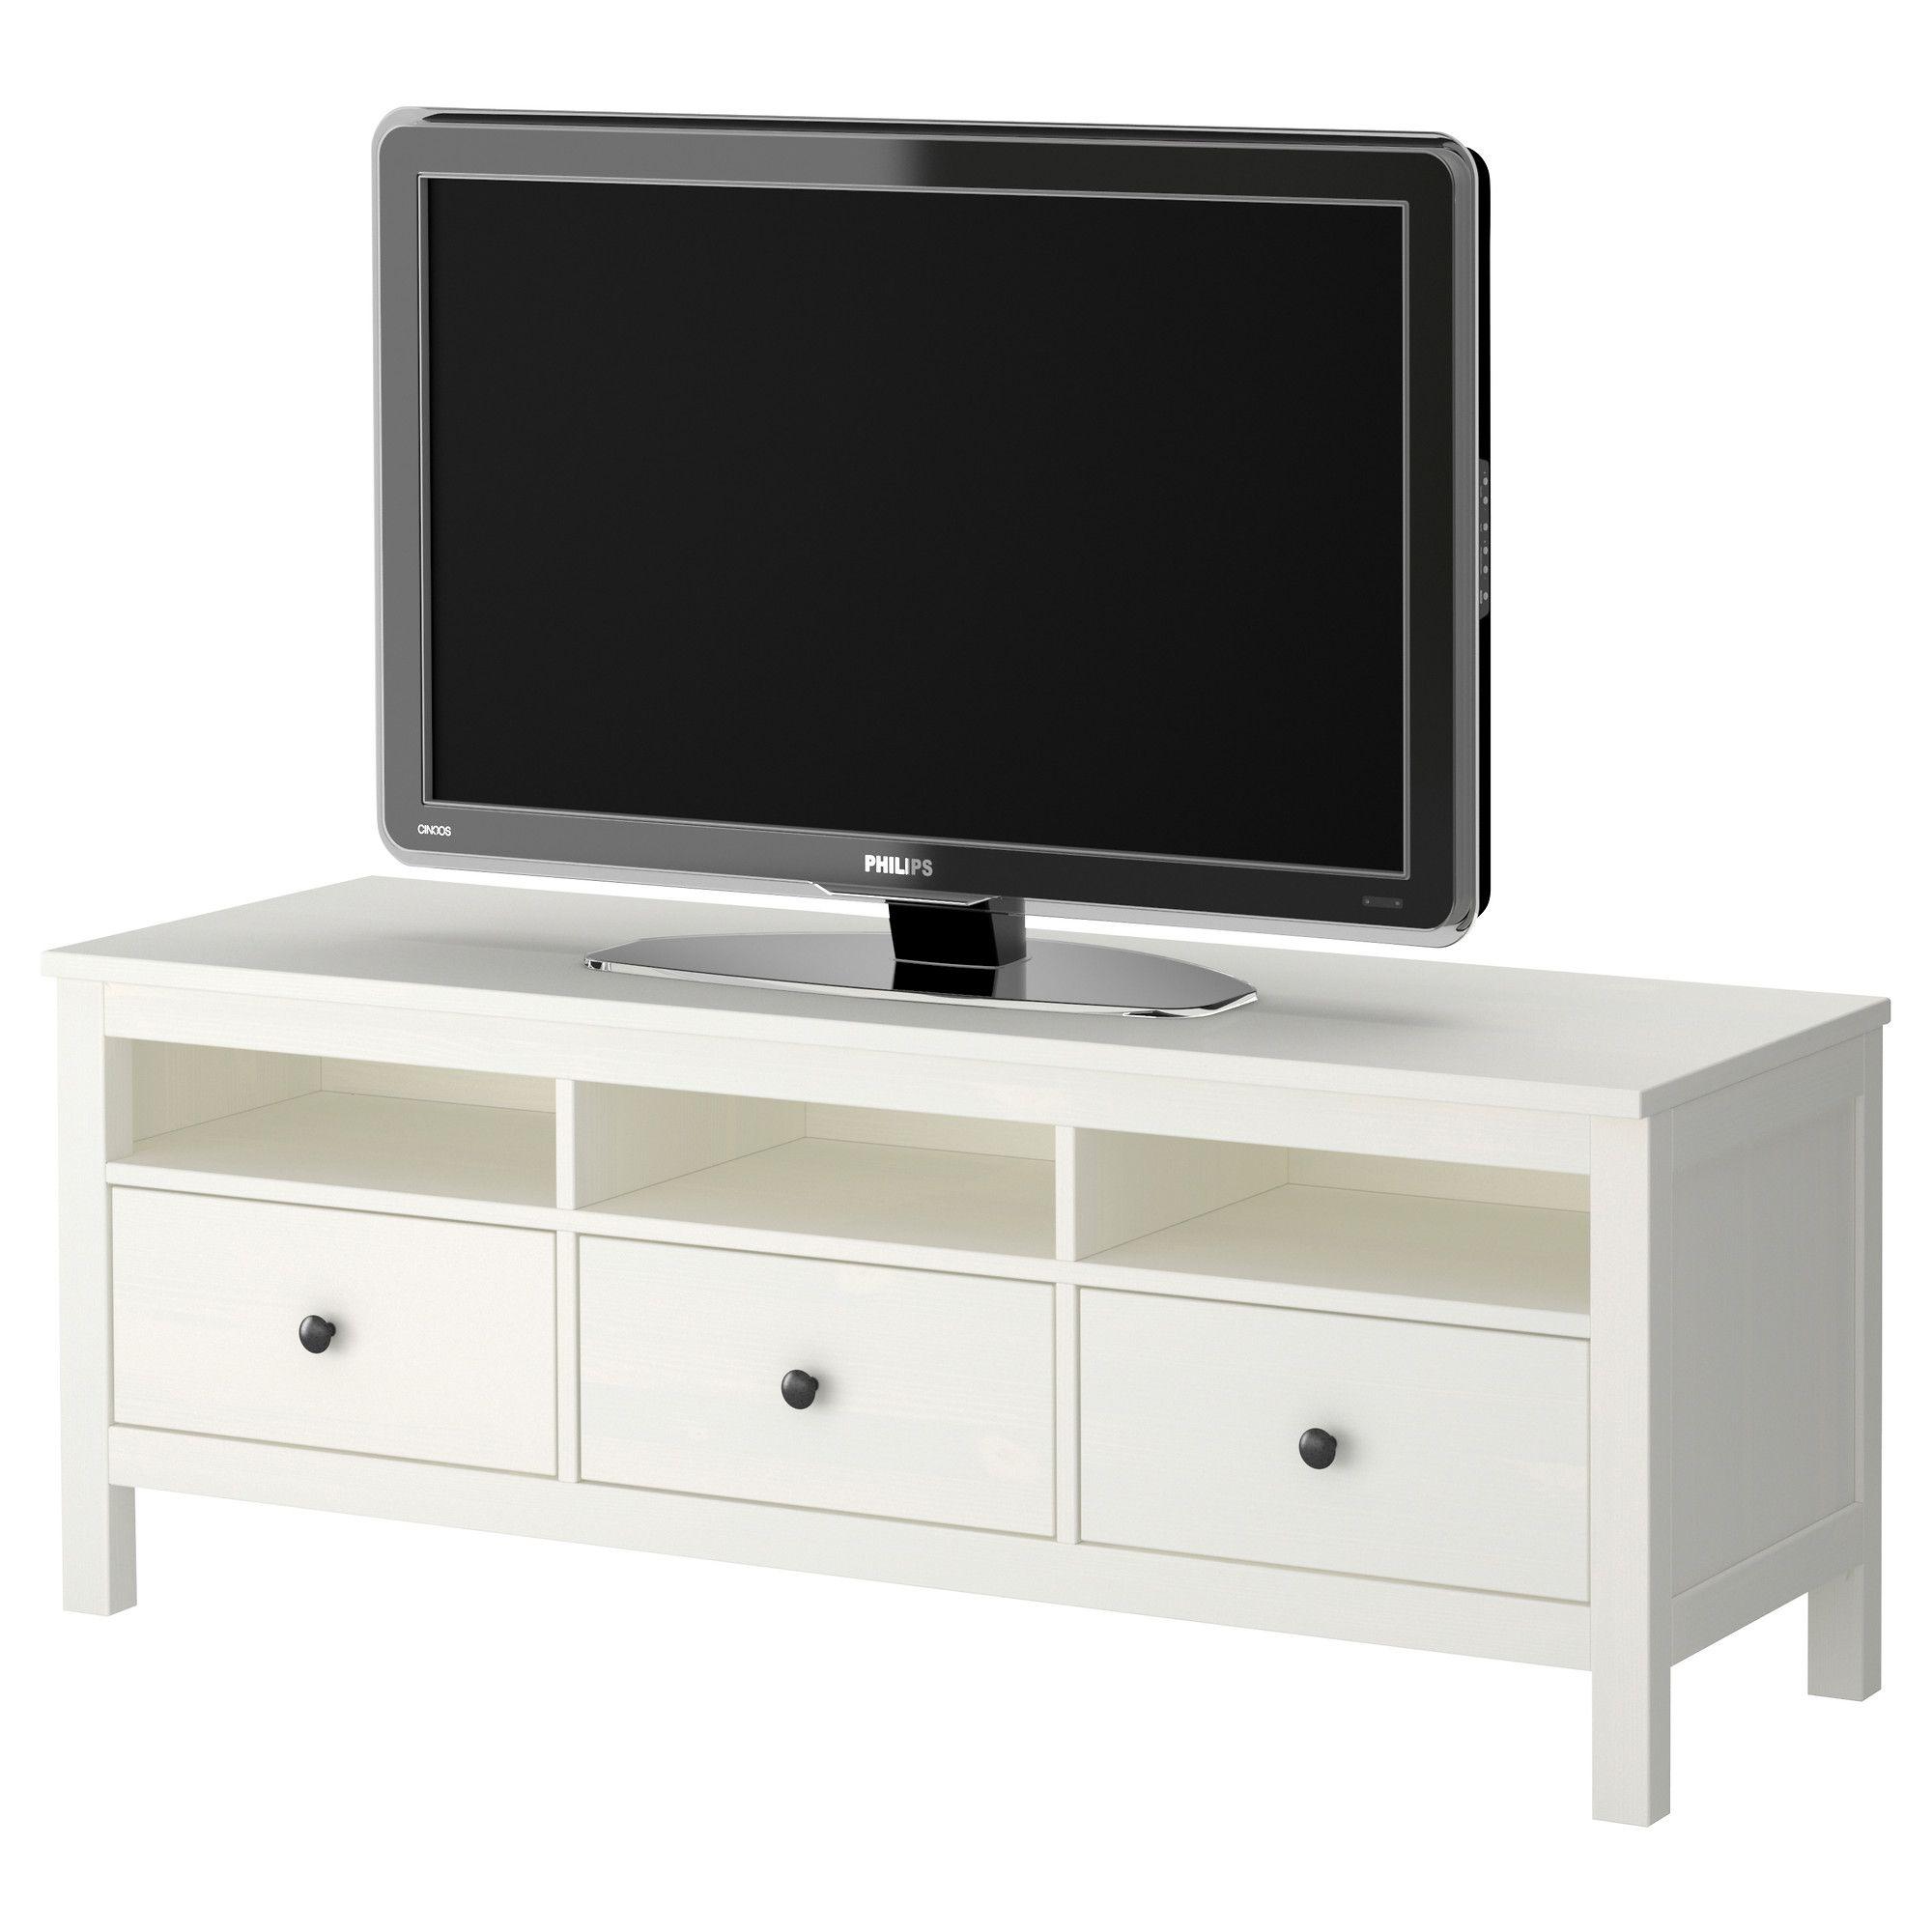 Hemnes mueble tv blanco ikea decoraci n muebles for Mueble tv ikea